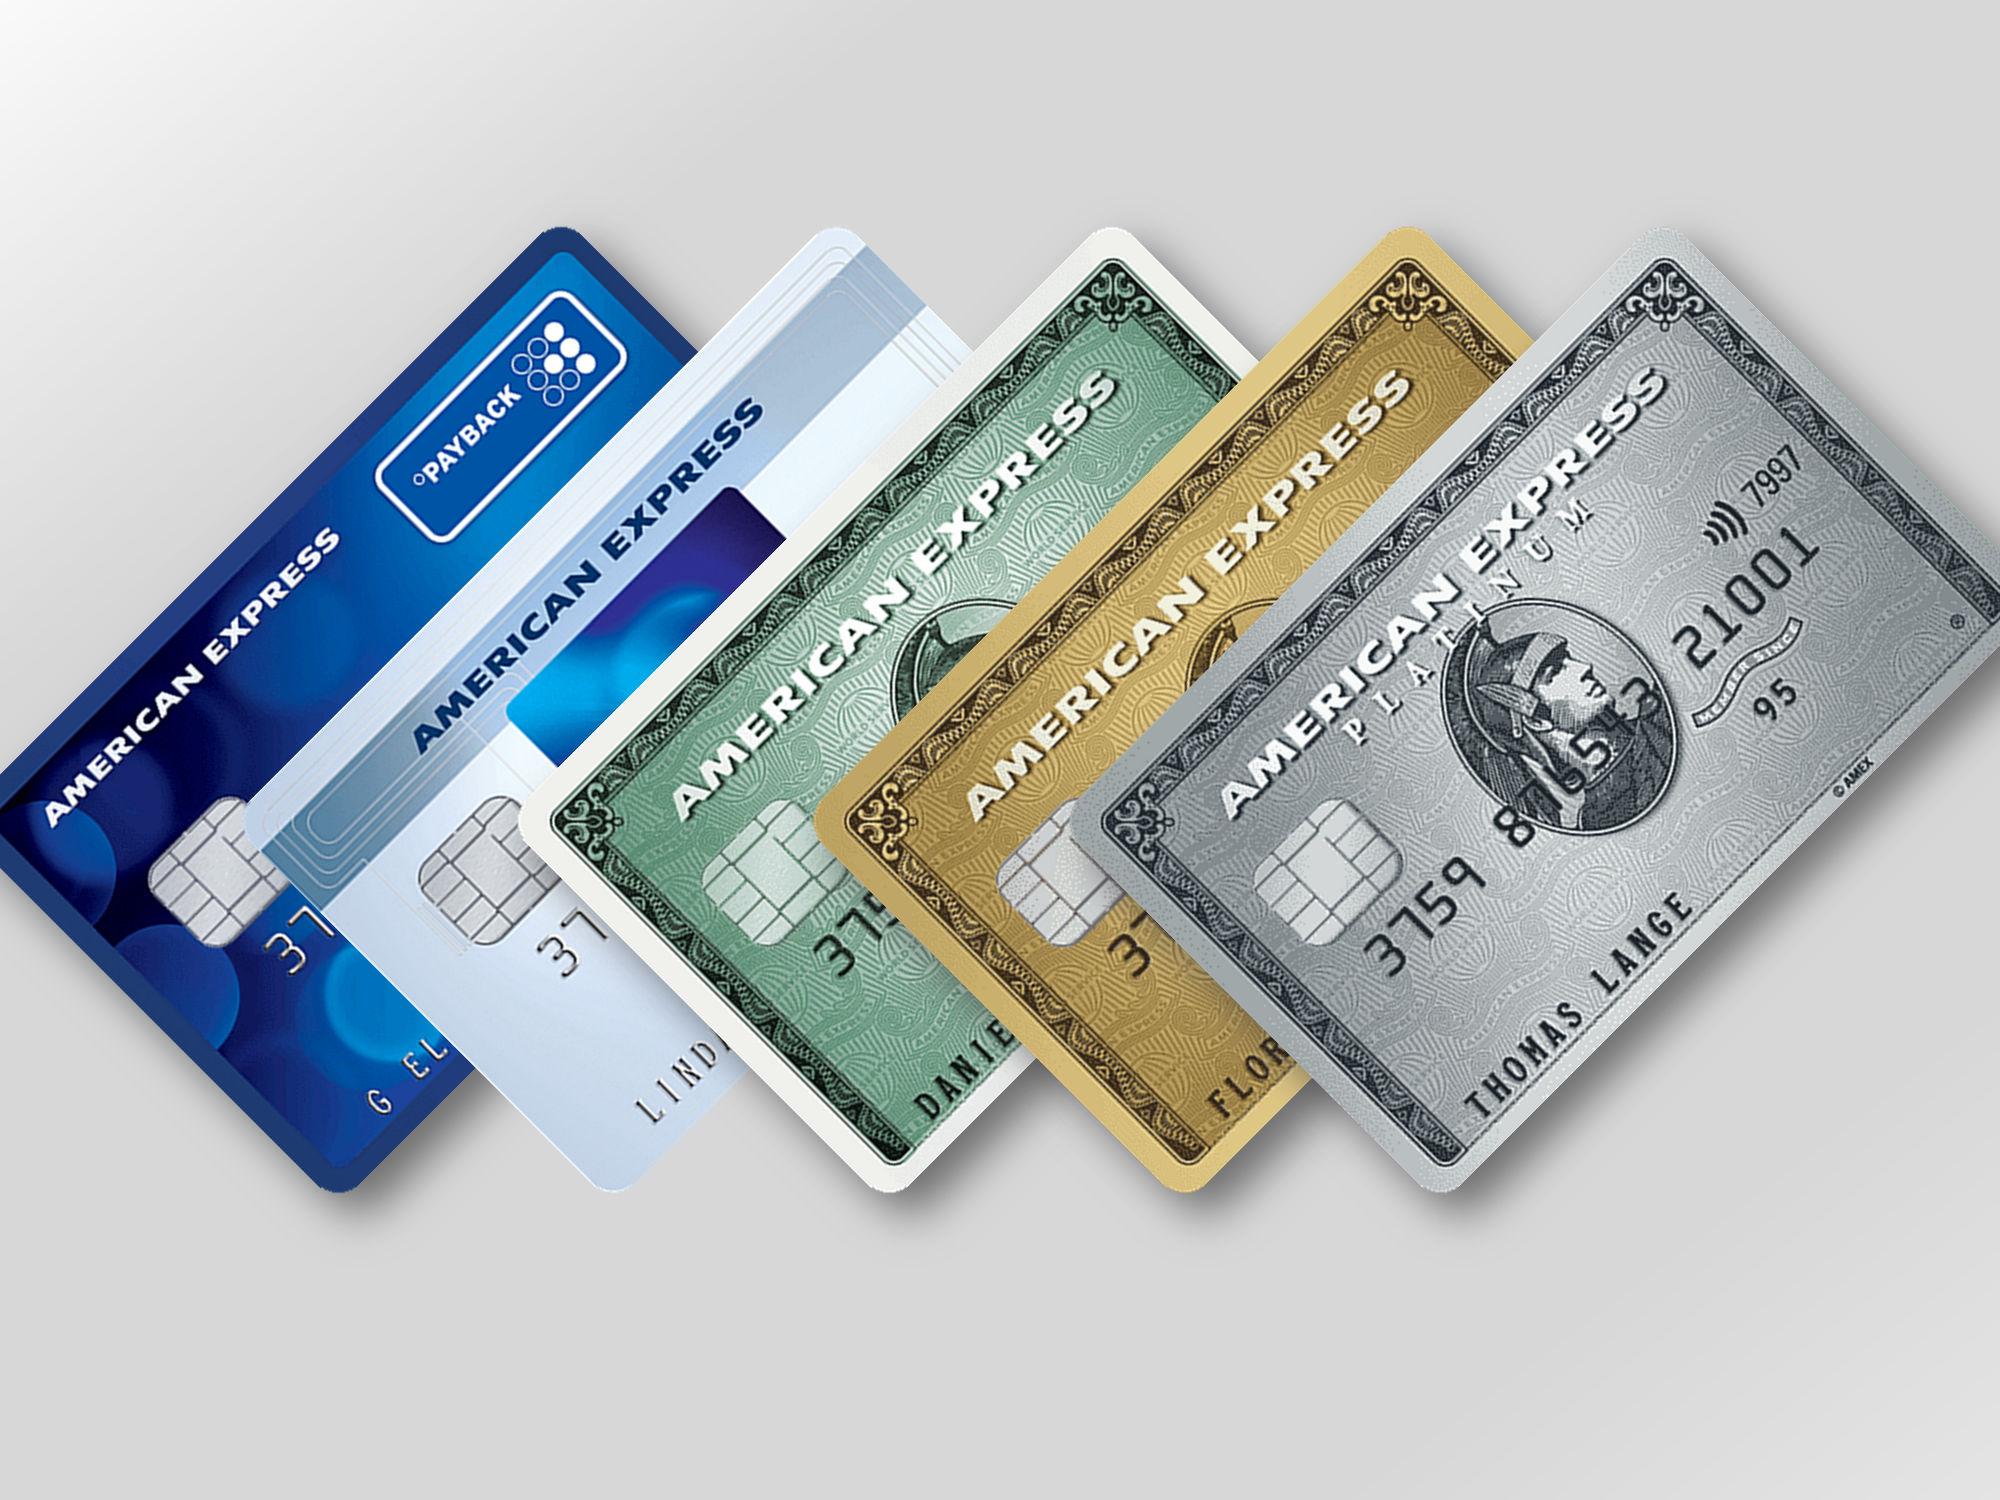 Die beste kostenlose American Express Kreditkarte meilenoptimieren